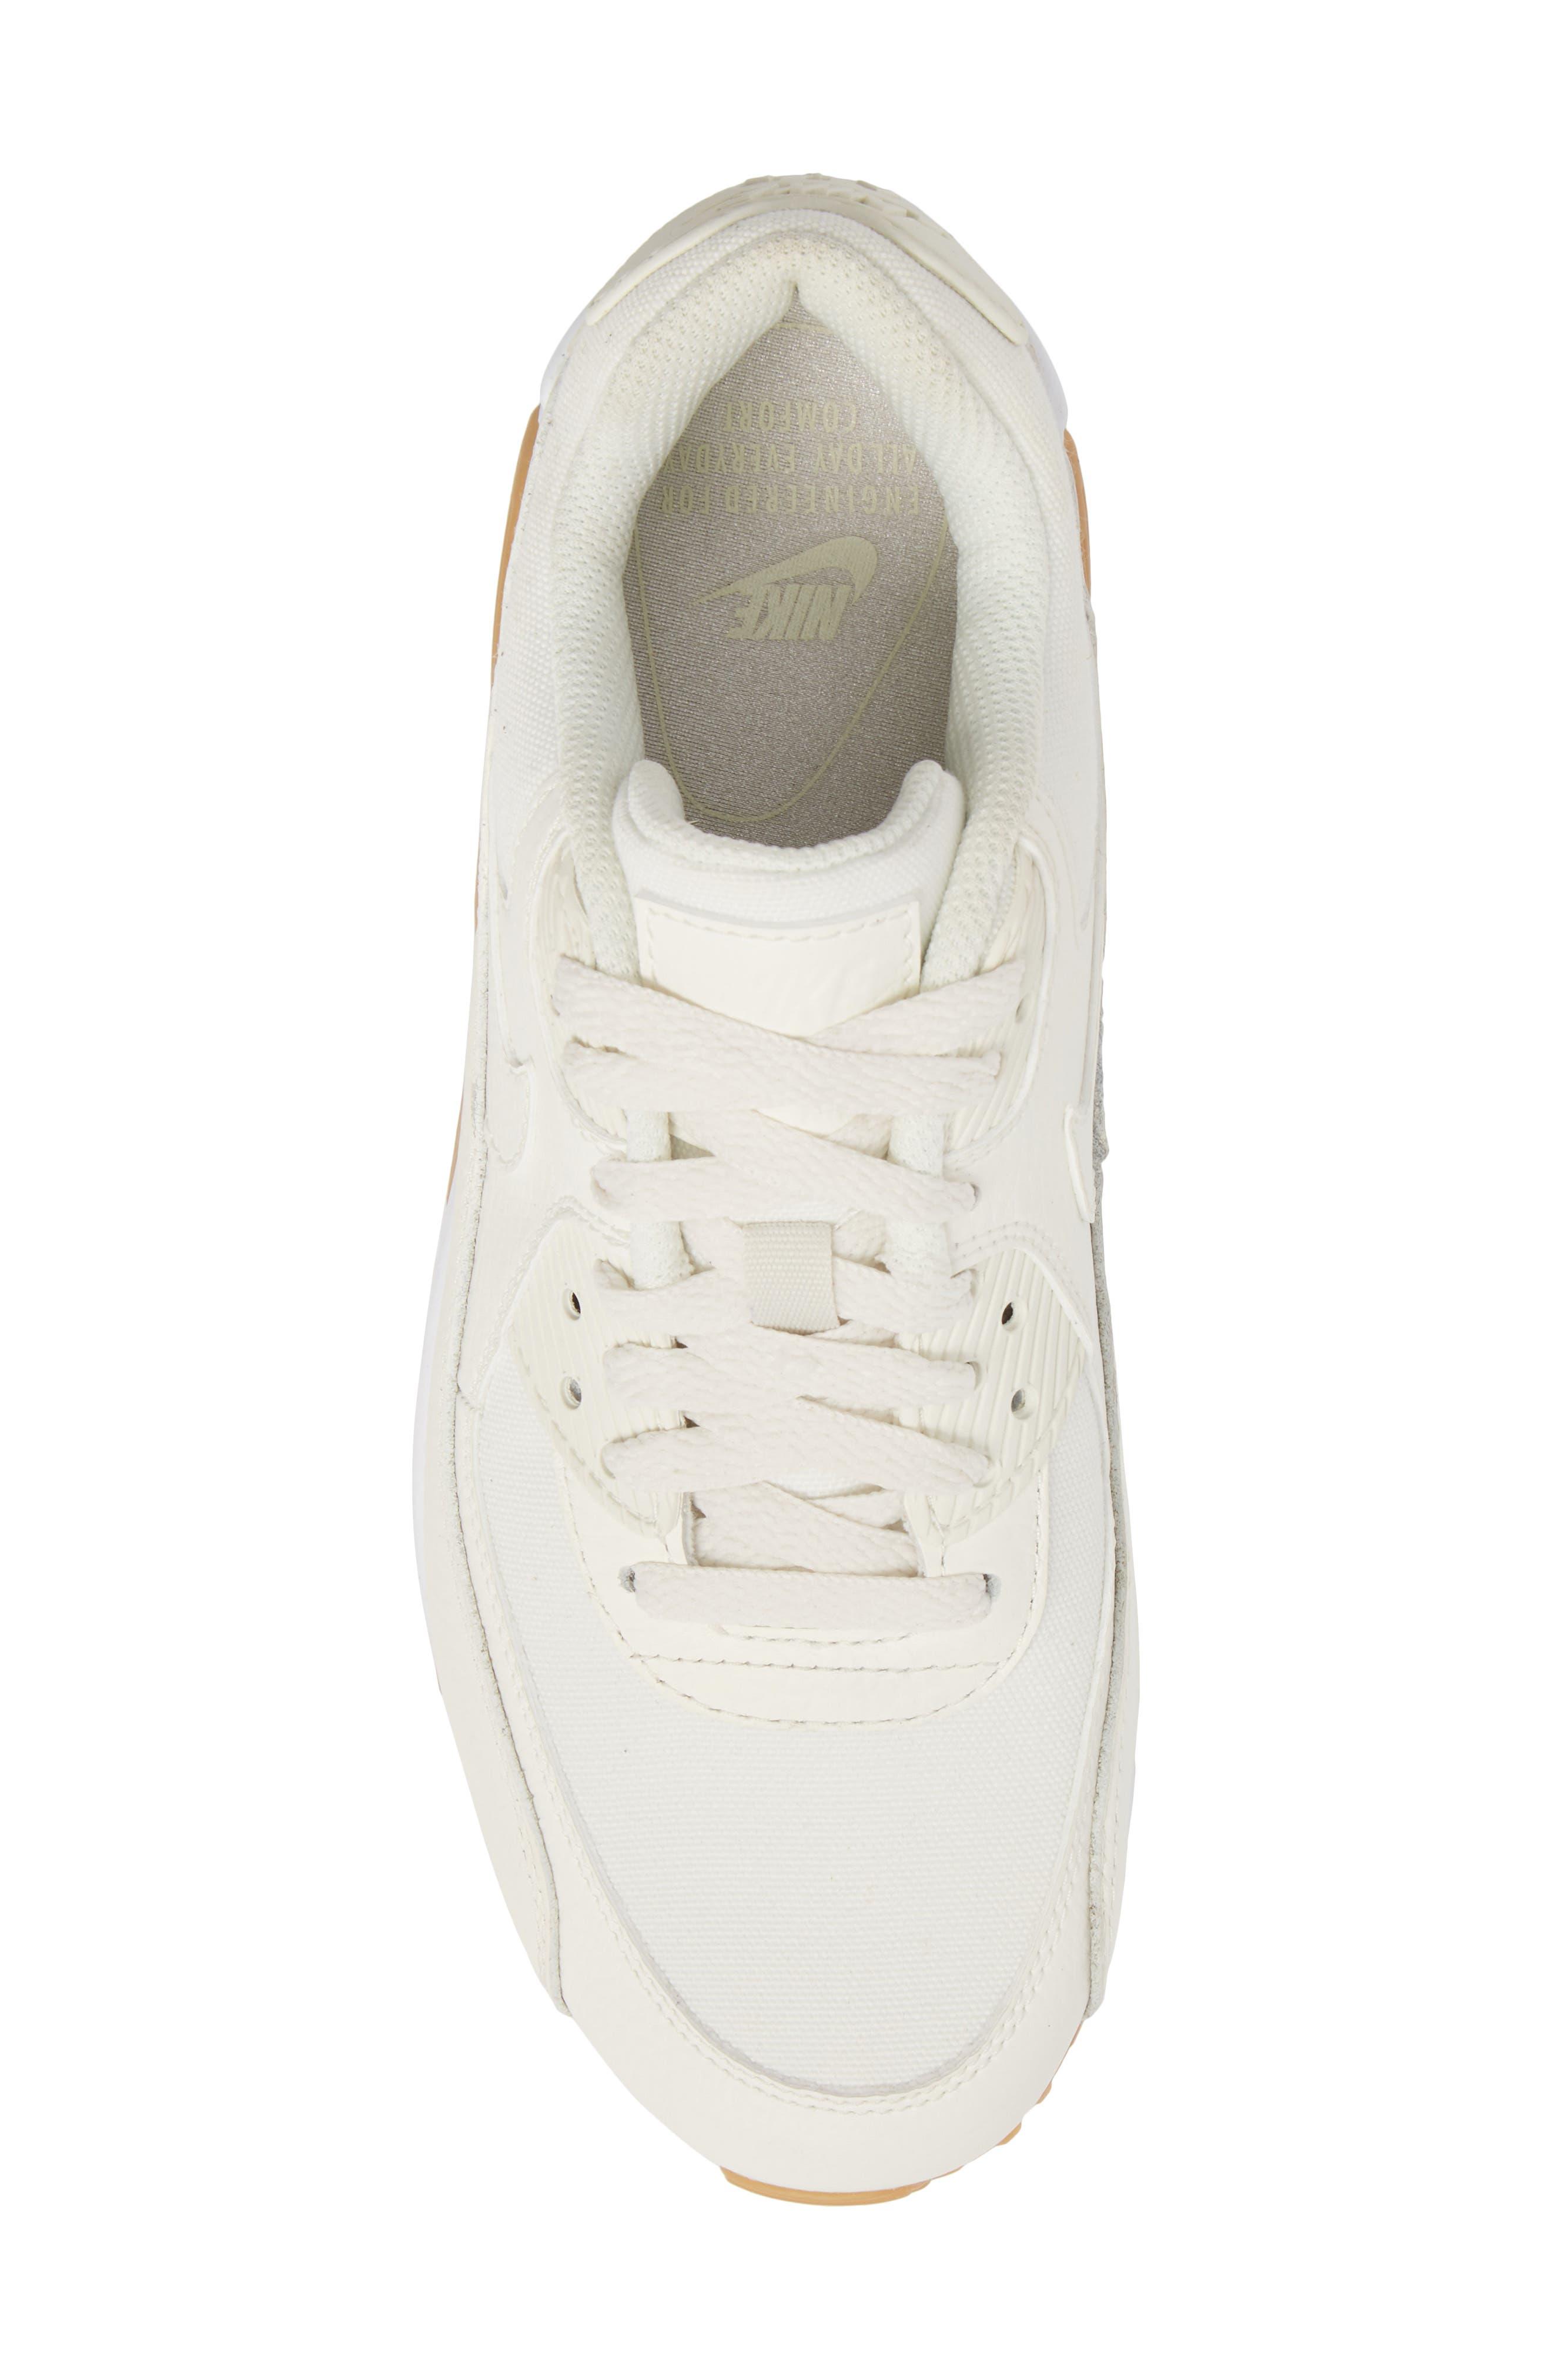 Air Max 90 Premium Sneaker,                             Alternate thumbnail 5, color,                             Sail/ Light Brown/ White